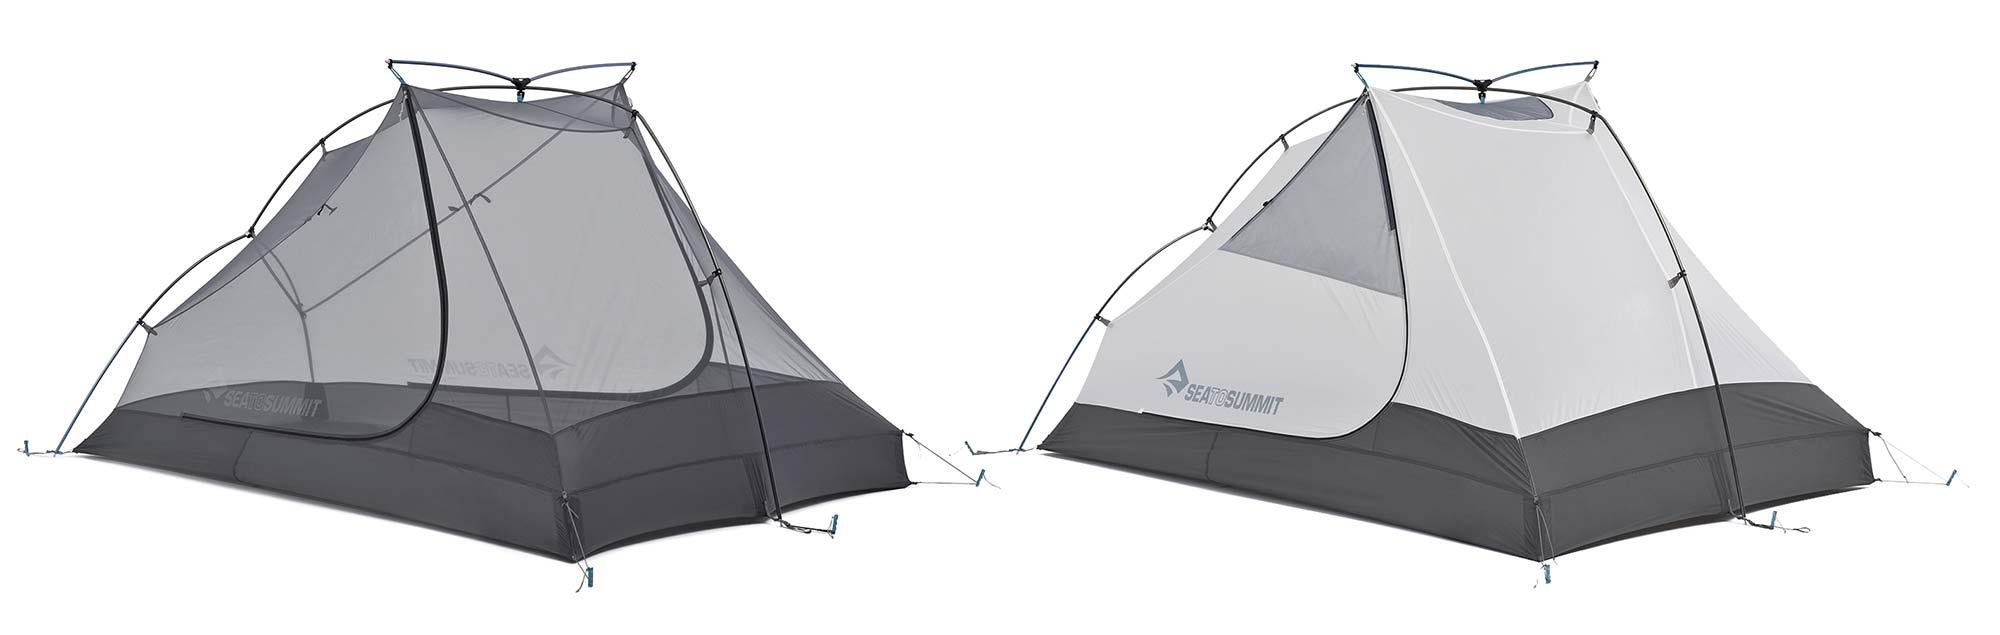 Sea to Summit Alto and Telos TR lightweight tents, Tension Ridge modular 3-season ultralight bikepacking tent,mesh or fabric